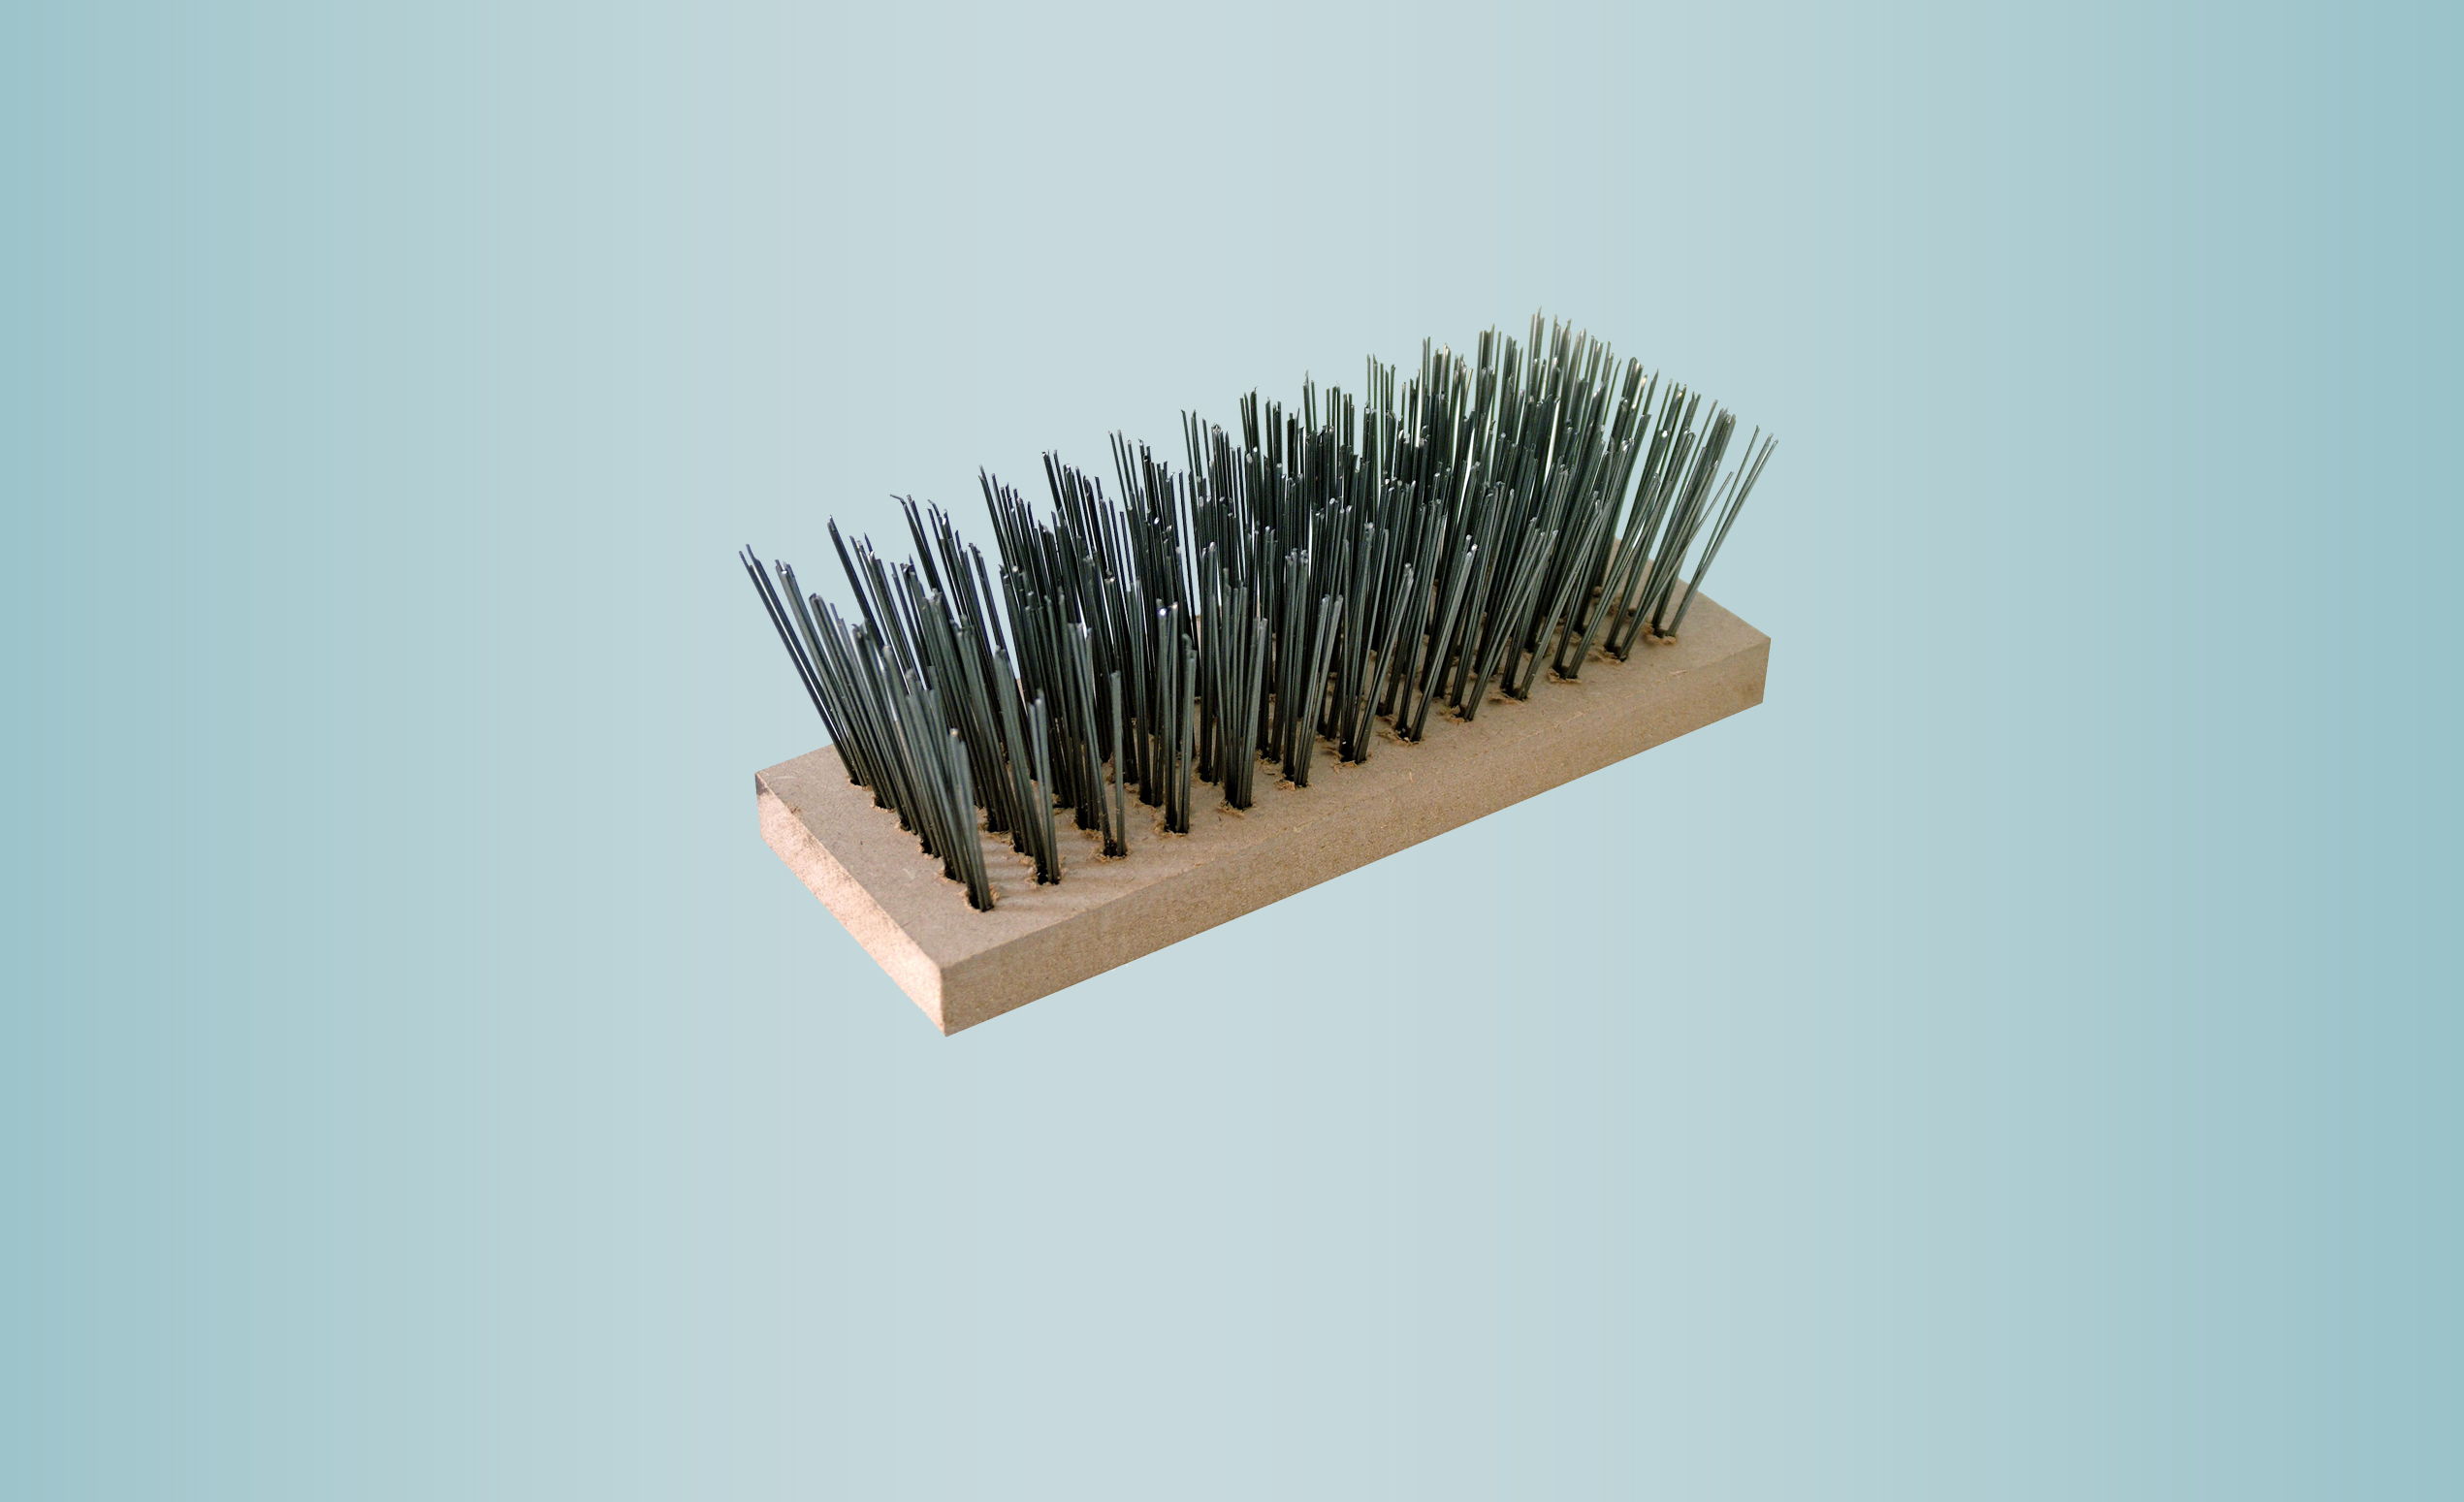 SPRINGBOK BROOM AND BRUSH COMPANY | Werner Brushware